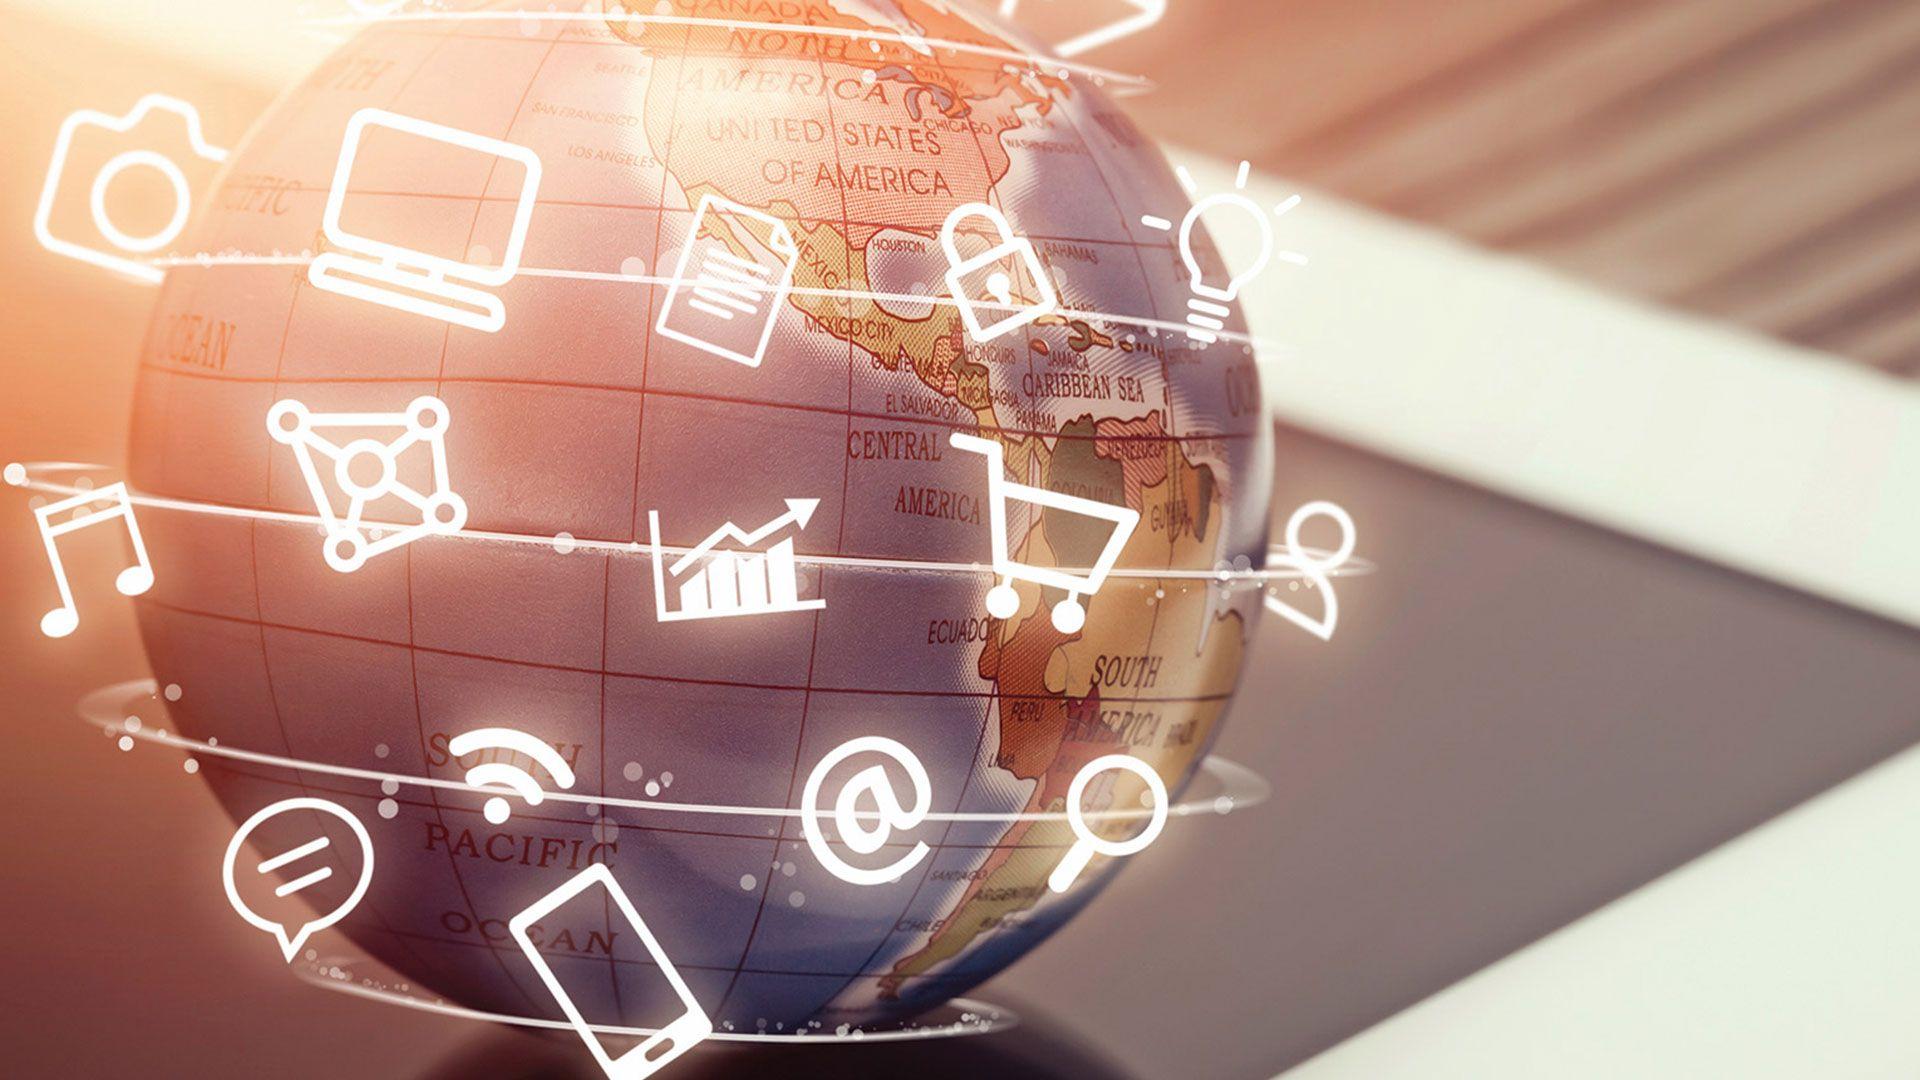 Digital Innovation Masterclass 2019 Planning in The Digital Age